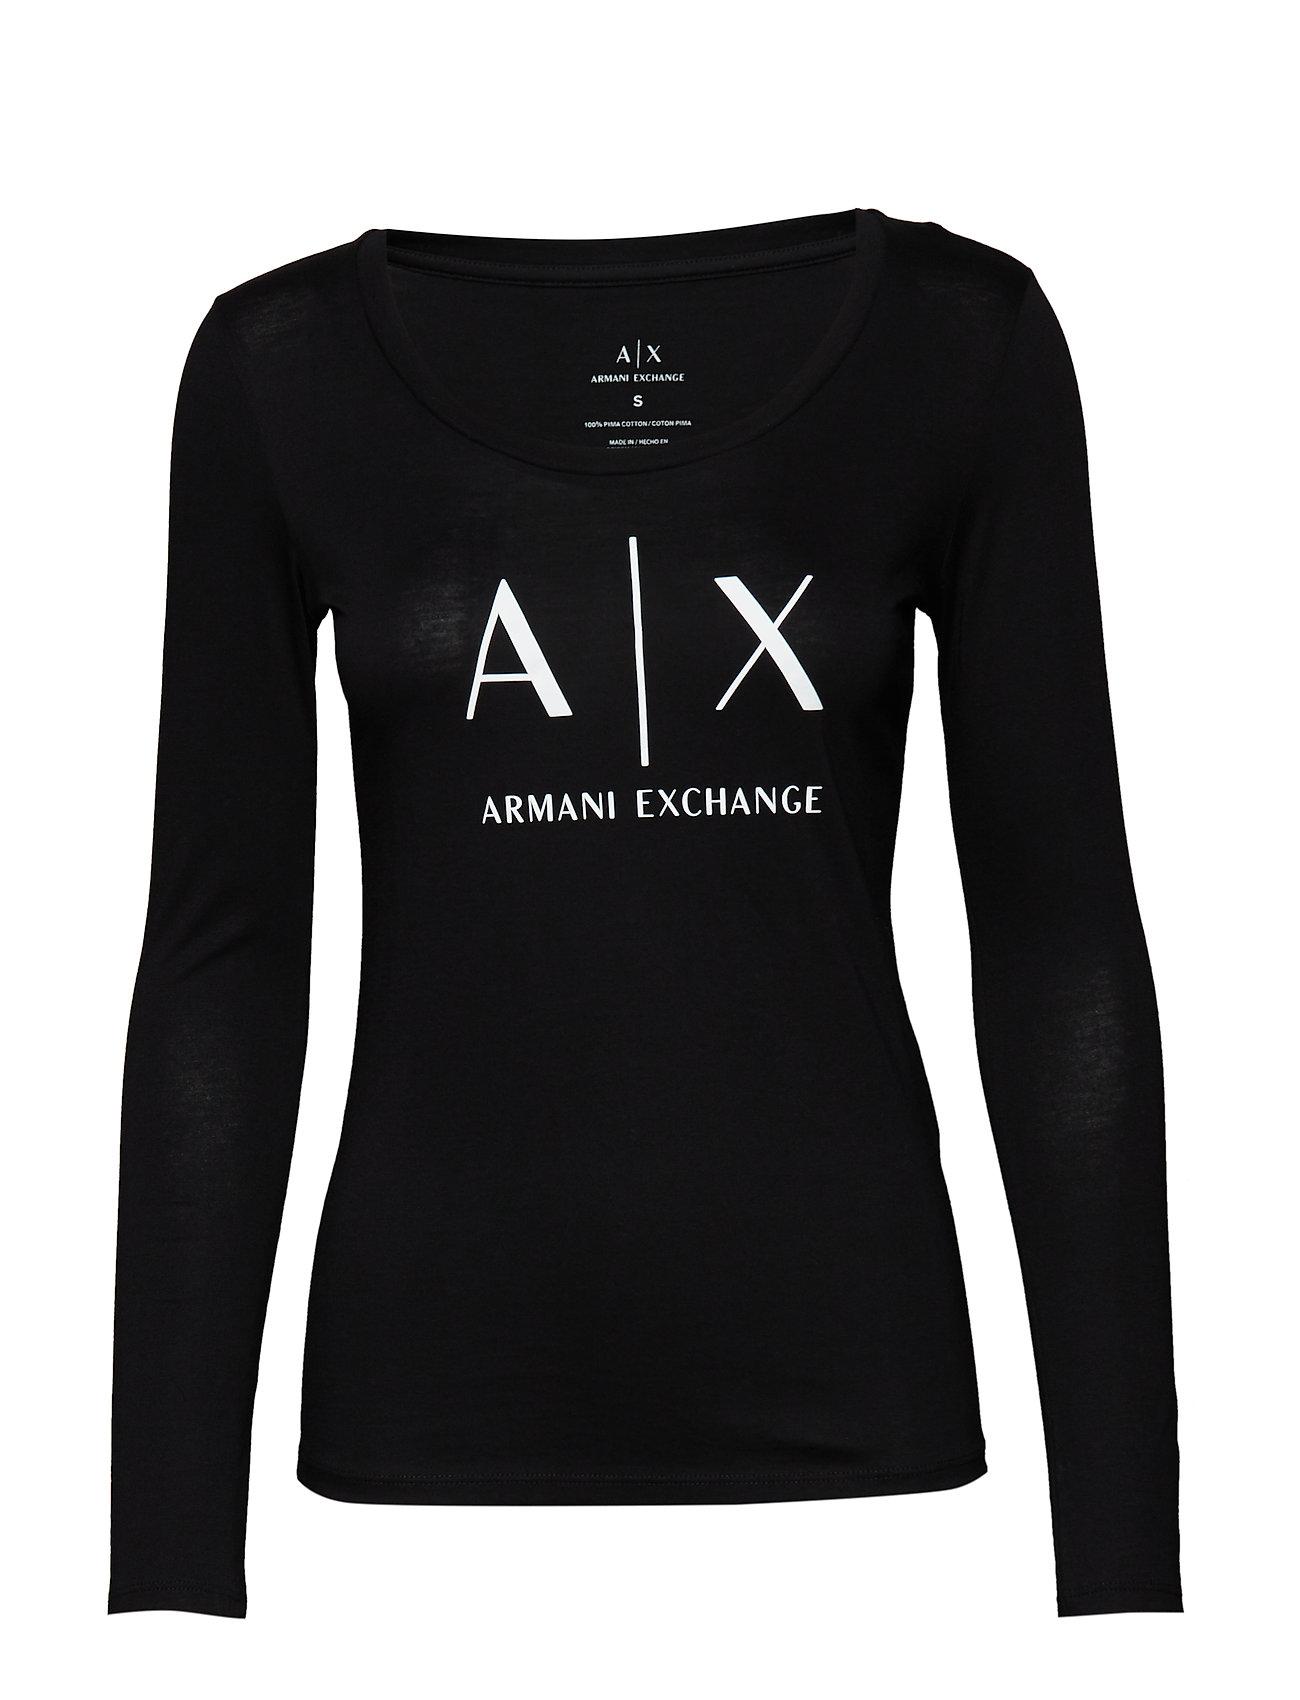 Image of Woman Jersey T-Shirt Langærmet T-shirt Sort ARMANI EXCHANGE (3132352413)